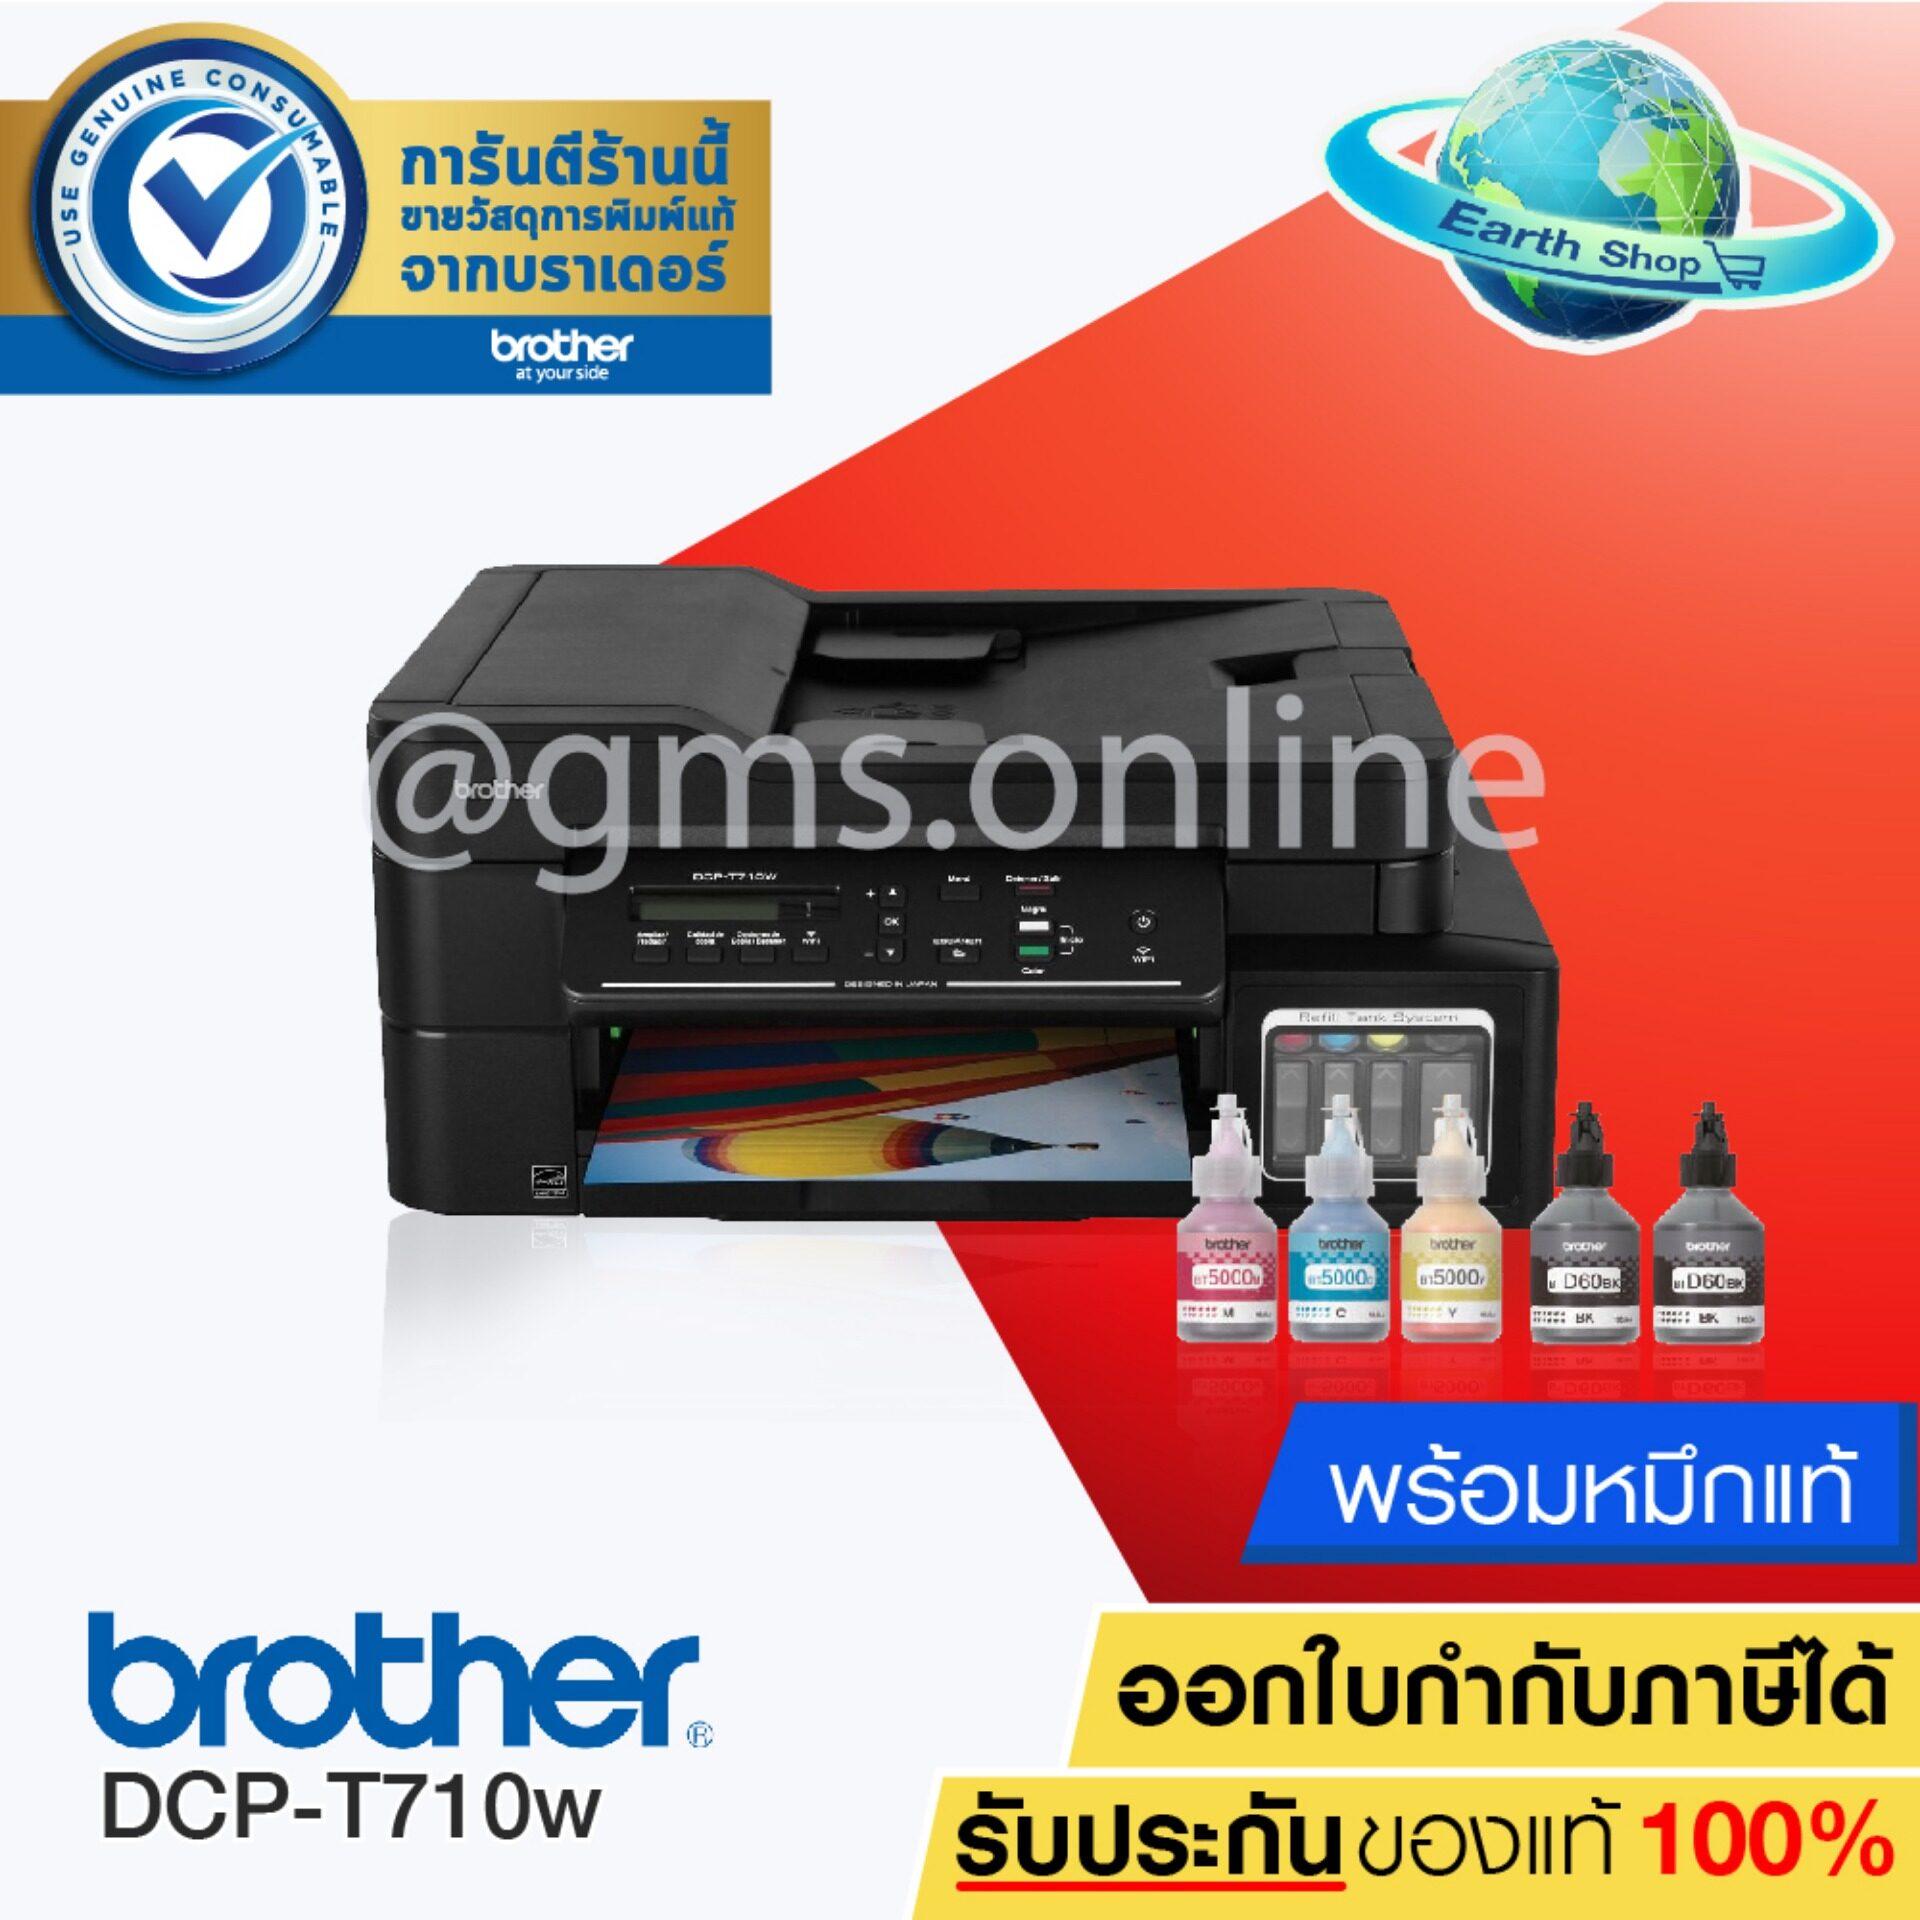 Brother Printer Dcp-T710w เครื่องพิมพ์มัลติฟังชั่นสี พร้อมหมึกใช้งาน 1 ชุด (สีดำ 2 ขวด และสีอย่างละ 1 ขวด) Earth Shop.